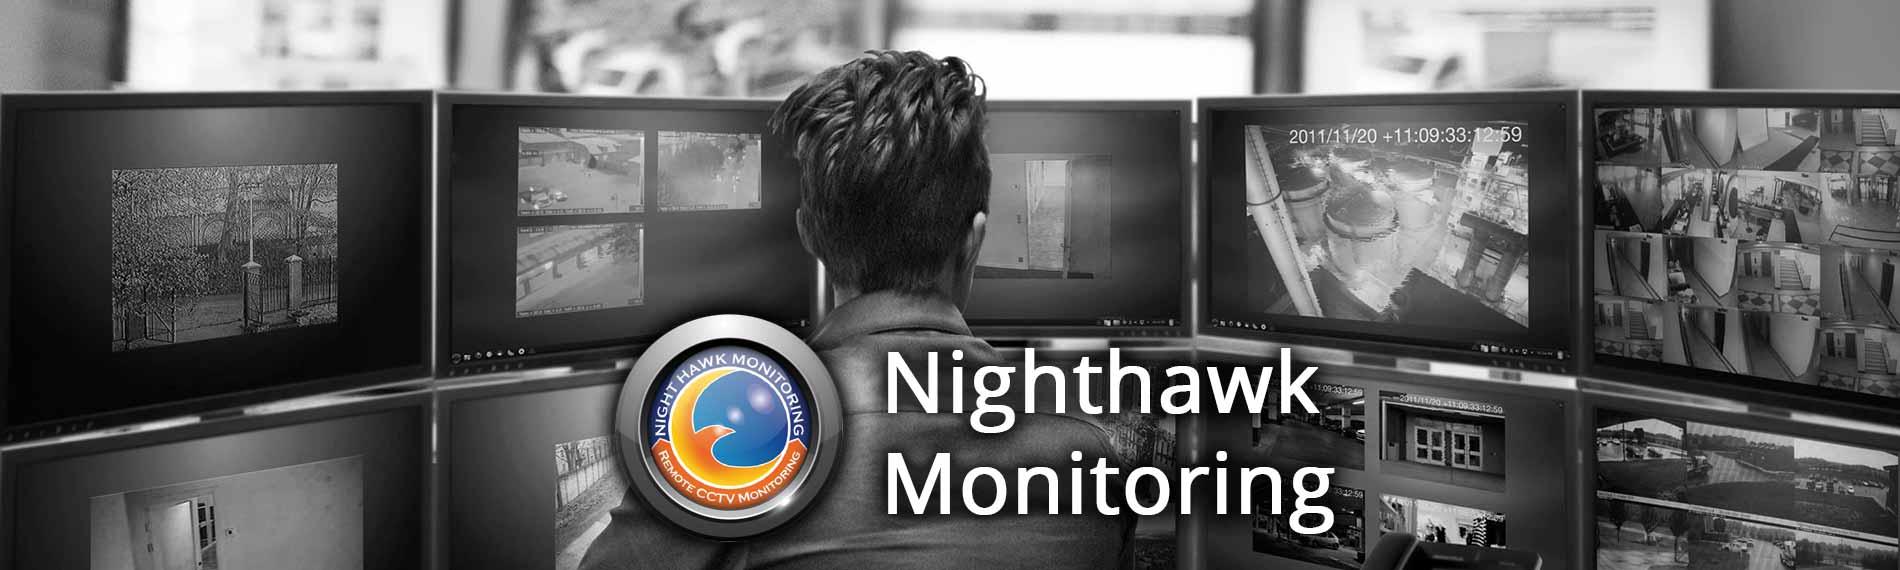 JENSEN BEACH REMOTE VIDEO SURVEILLANCE SECURITY CAMERAS MONITORING SYSTEM SERVICES COMPANY JENSEN BEACH FLORIDA